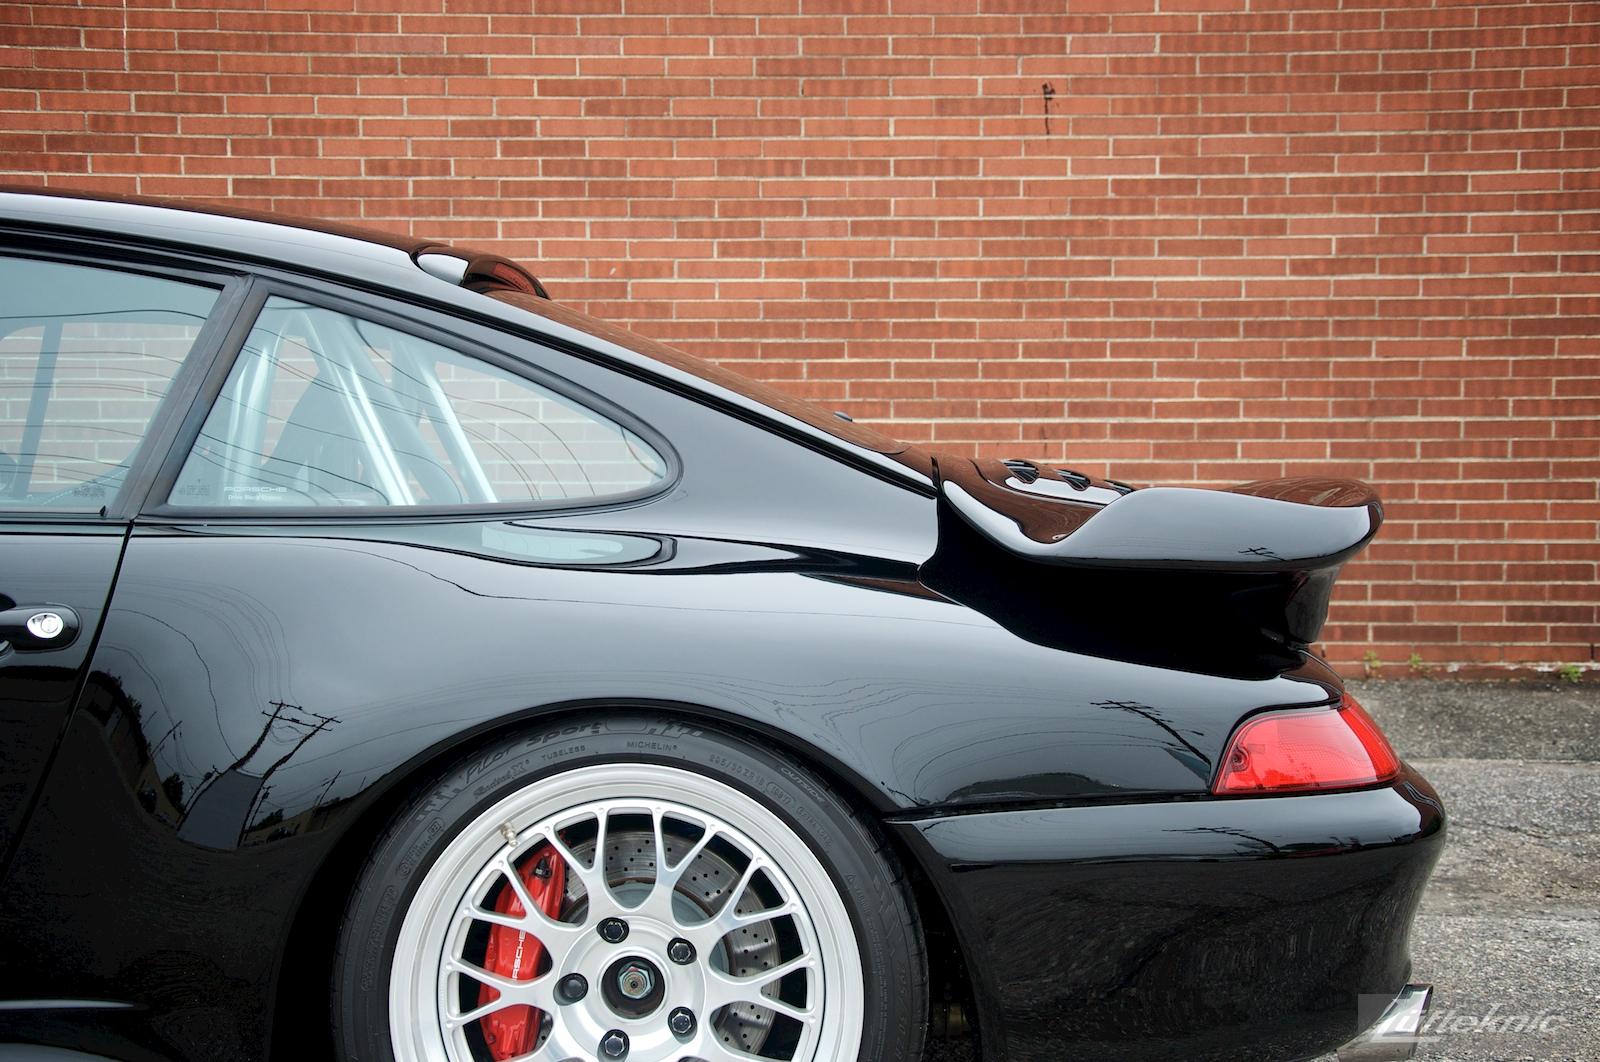 A black 993 Porsche Turbo GT2 conversion sits in the Lufteknic parking lot.